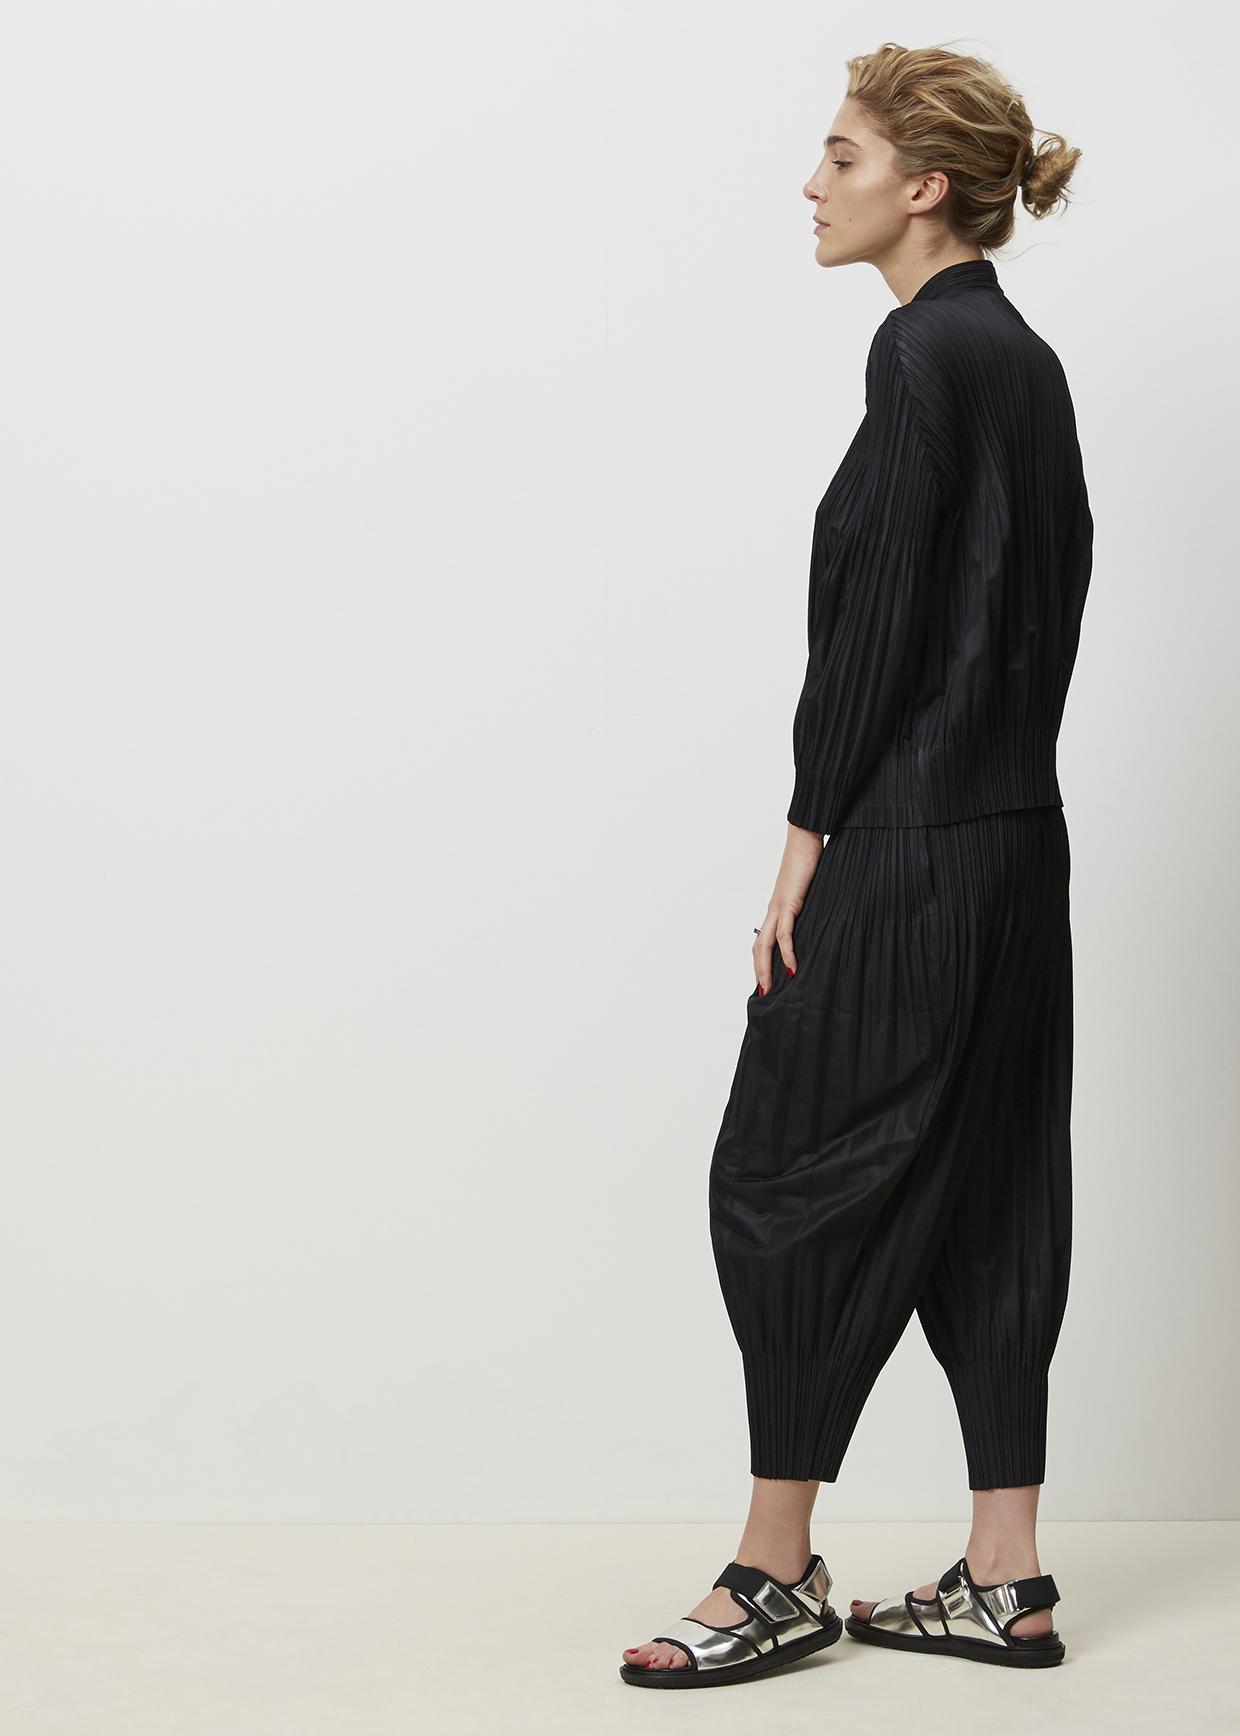 000b31bdf8bce Lyst - Pleats Please Issey Miyake Black Fluffy Pleats Pant in Black